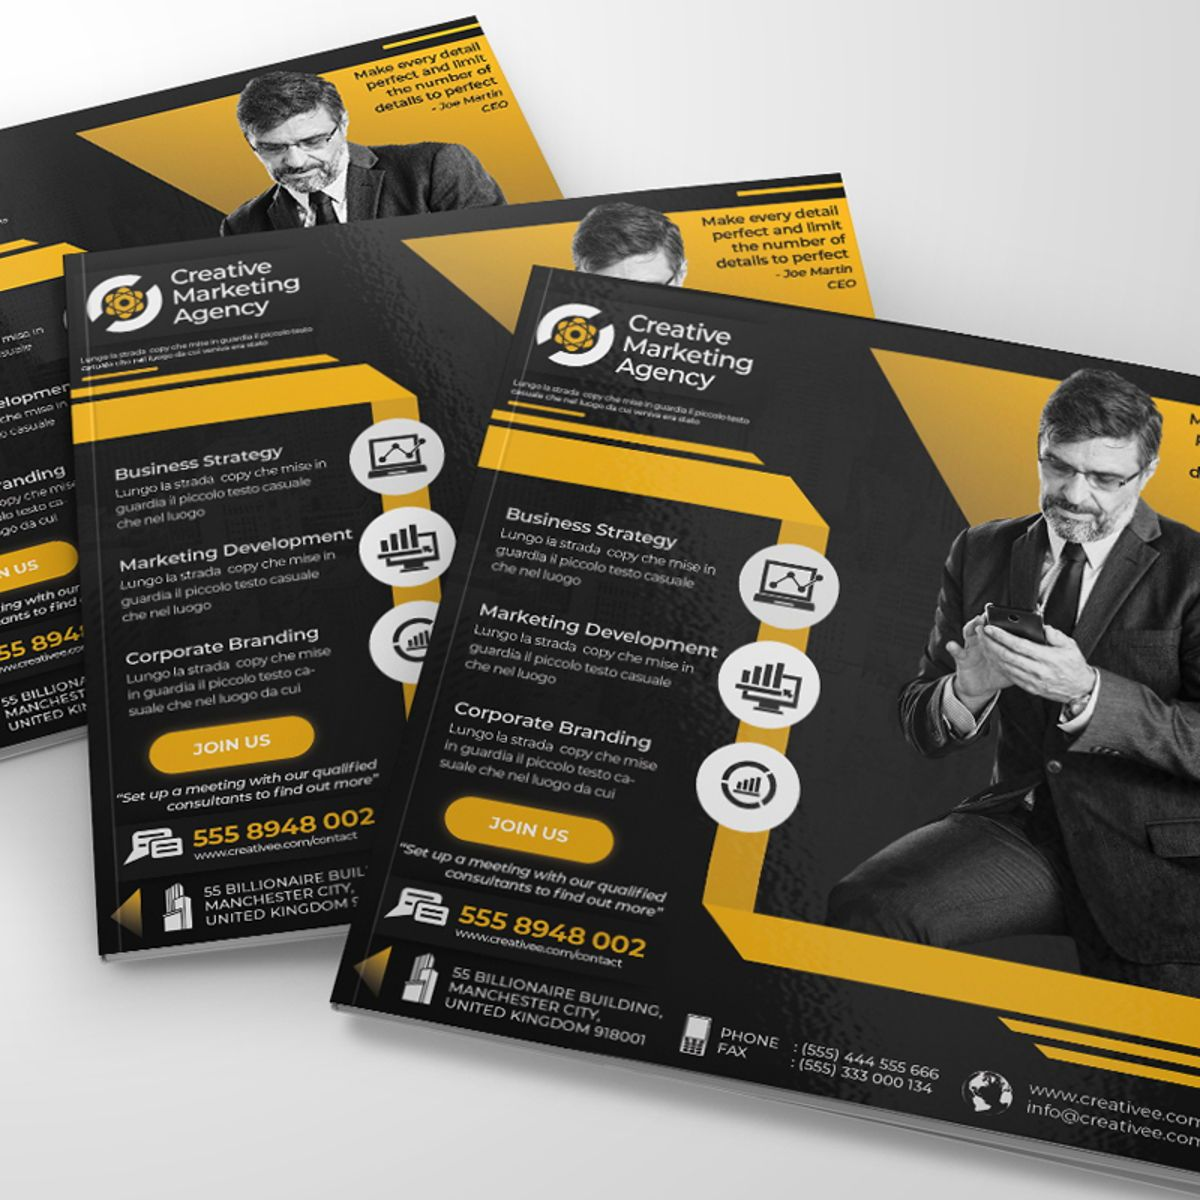 Creative Agency Flyer Template, Diapositive 3, 08522, Business — PoweredTemplate.com